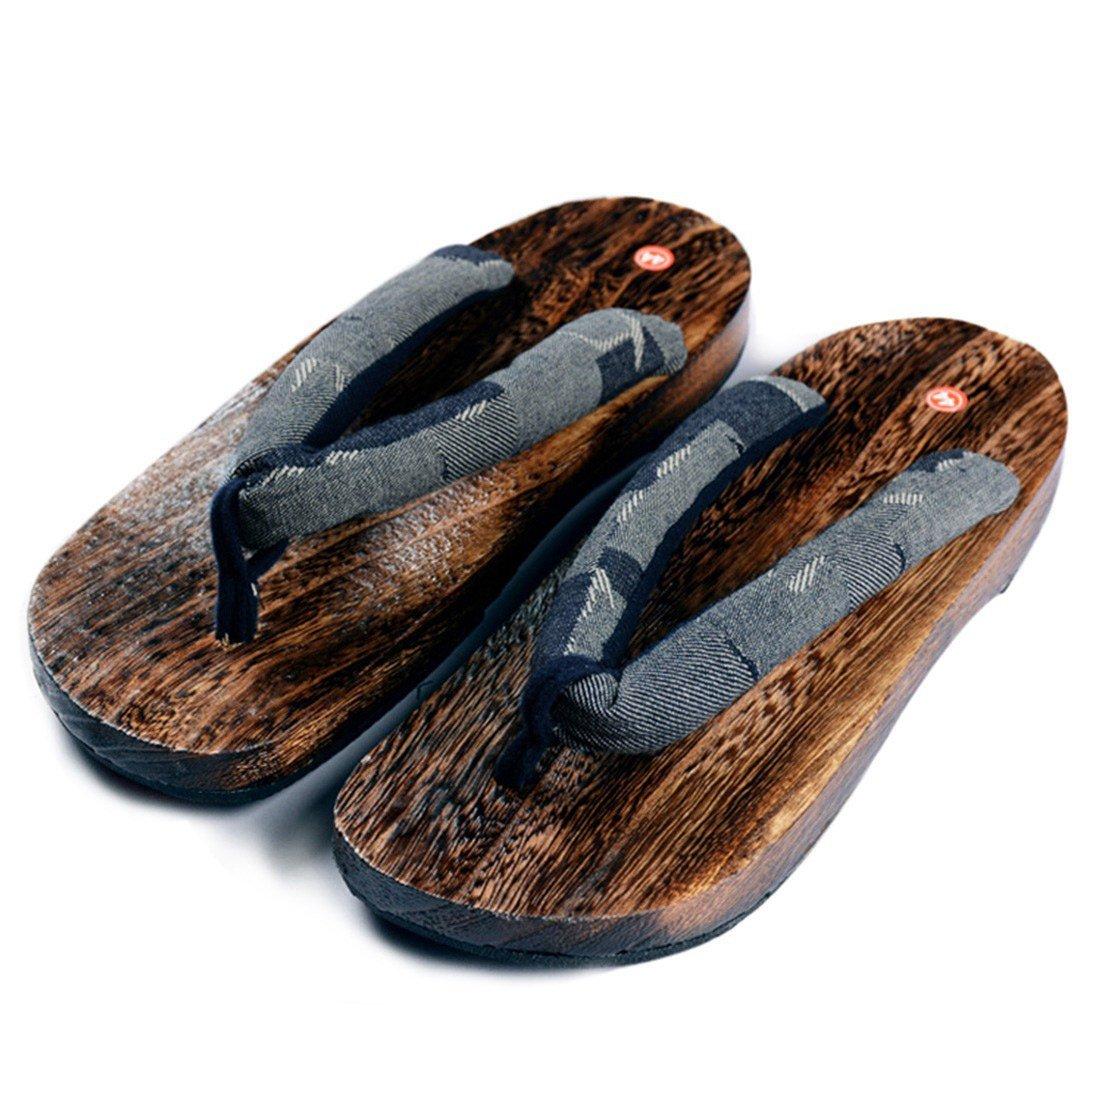 Qianle Mens Geta Japanese Traditional Flip Flops Sandals Wooden Shoes